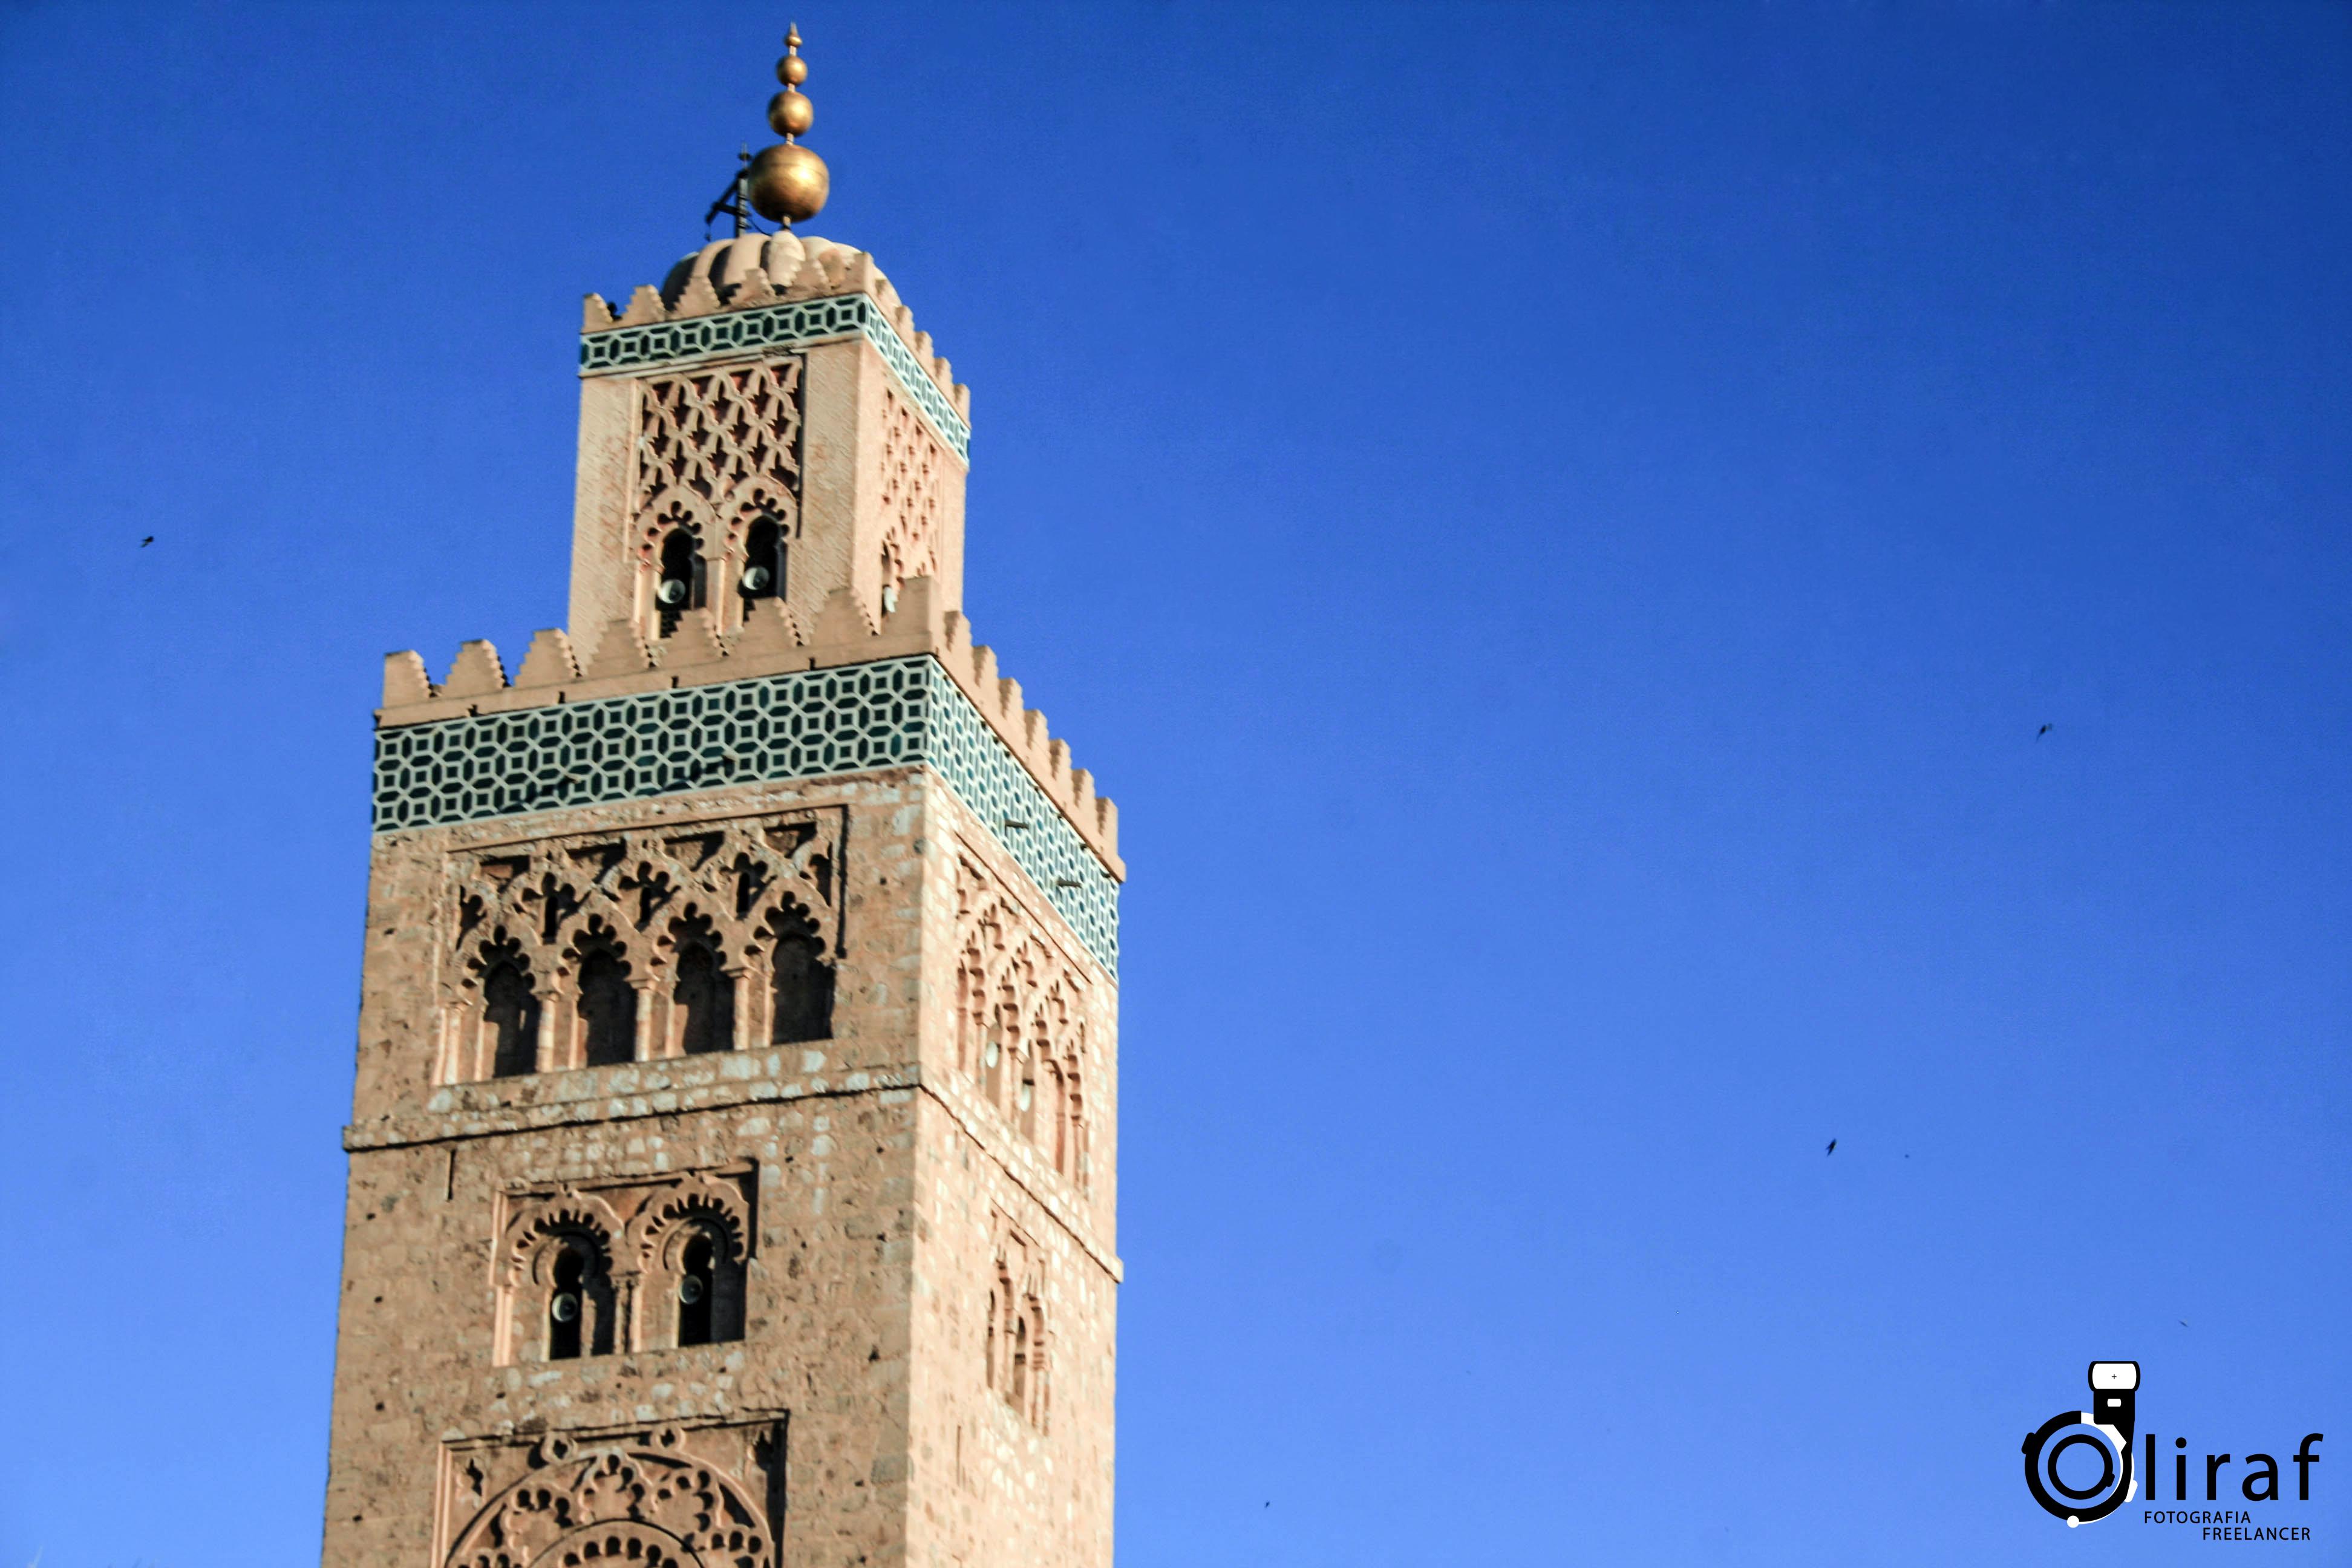 minaretekotobiamarraquexe